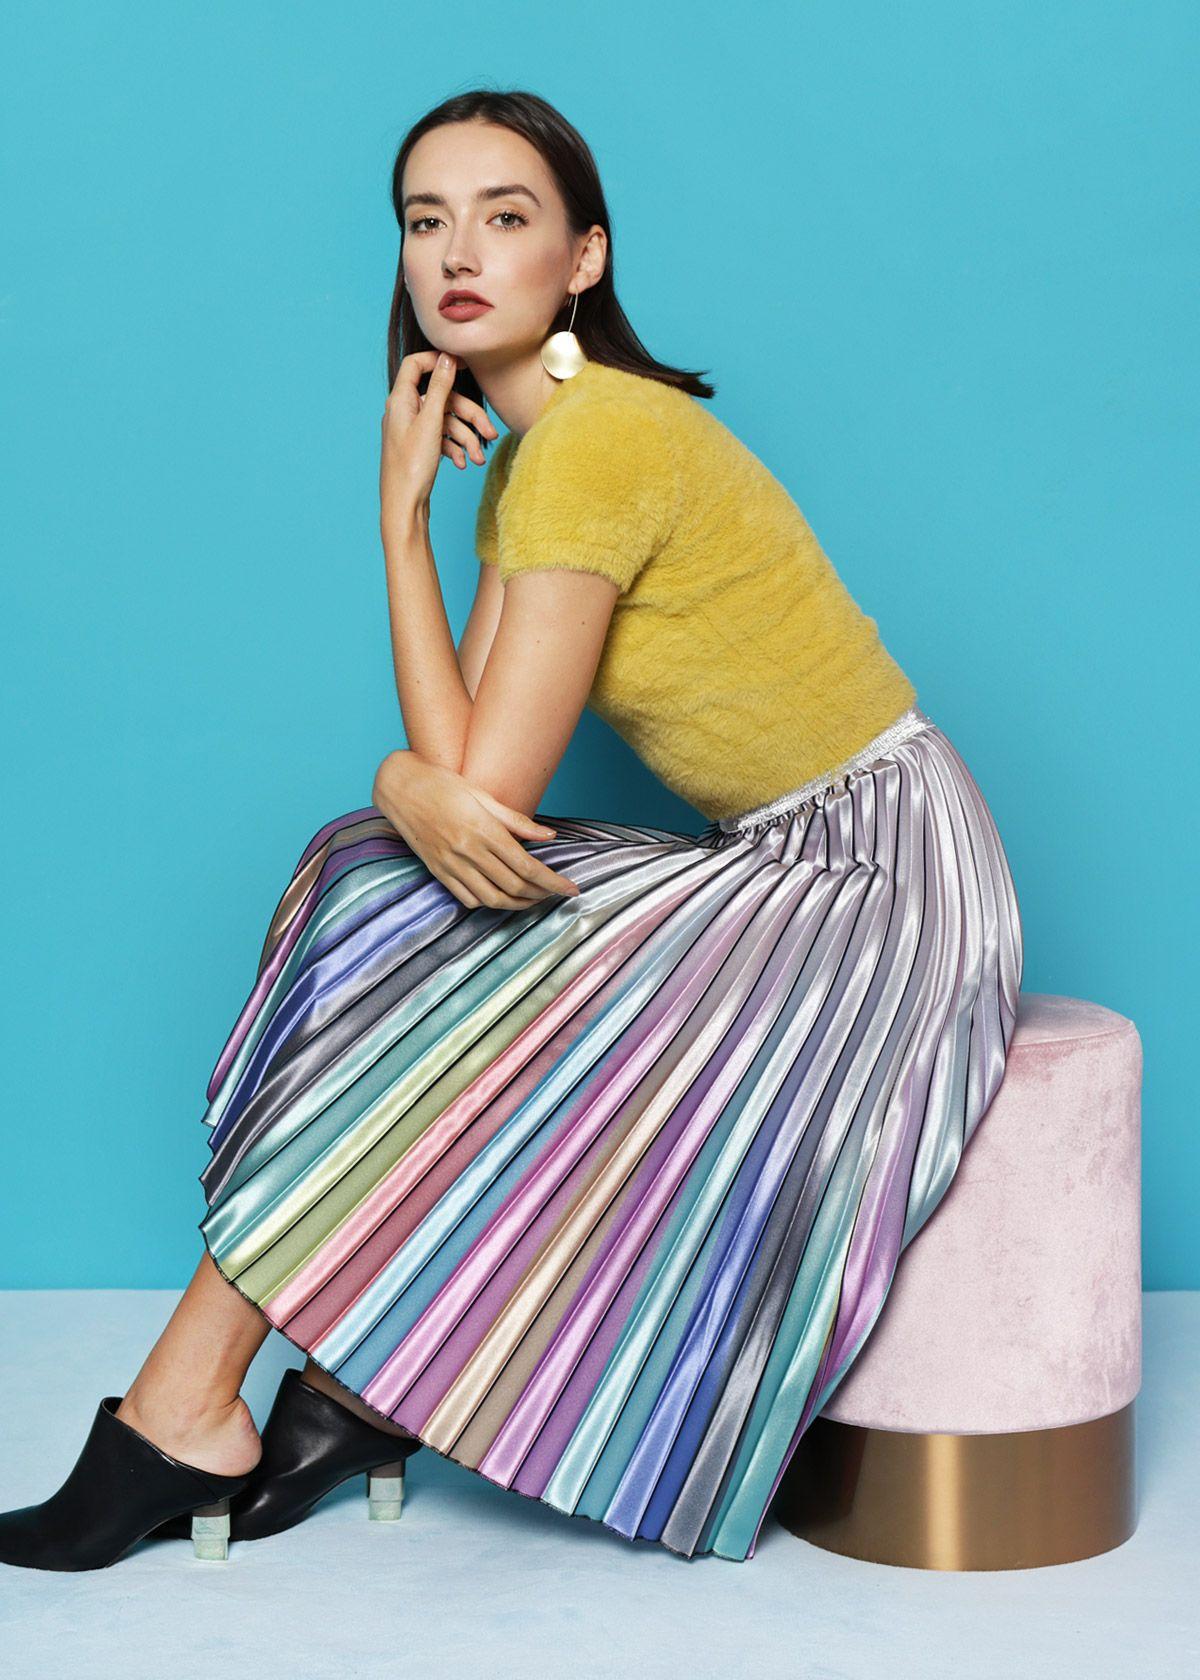 cd41ef74921d BO] Ombre Rainbow Pleat Skirt in 2019 | Reignbo Garb | Pleated Skirt ...